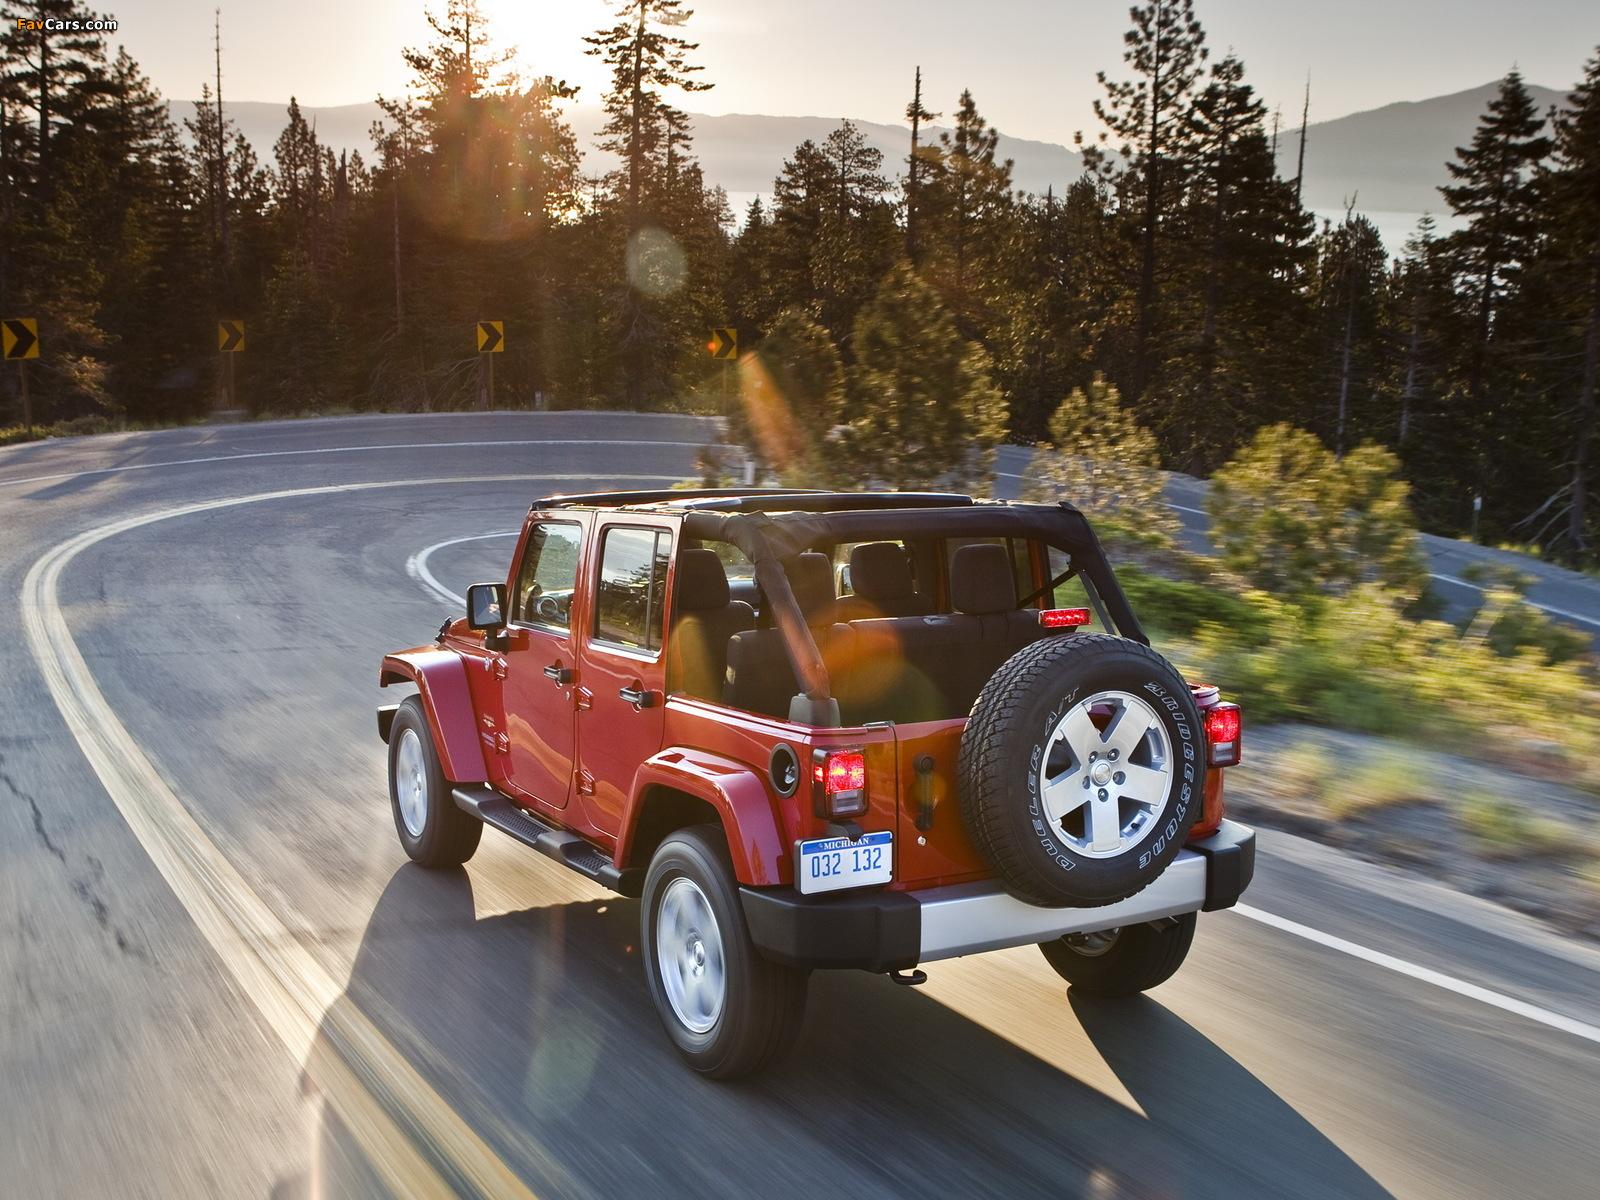 Jeep Wrangler Unlimited Sahara (JK) 2010 wallpapers (1600 x 1200)